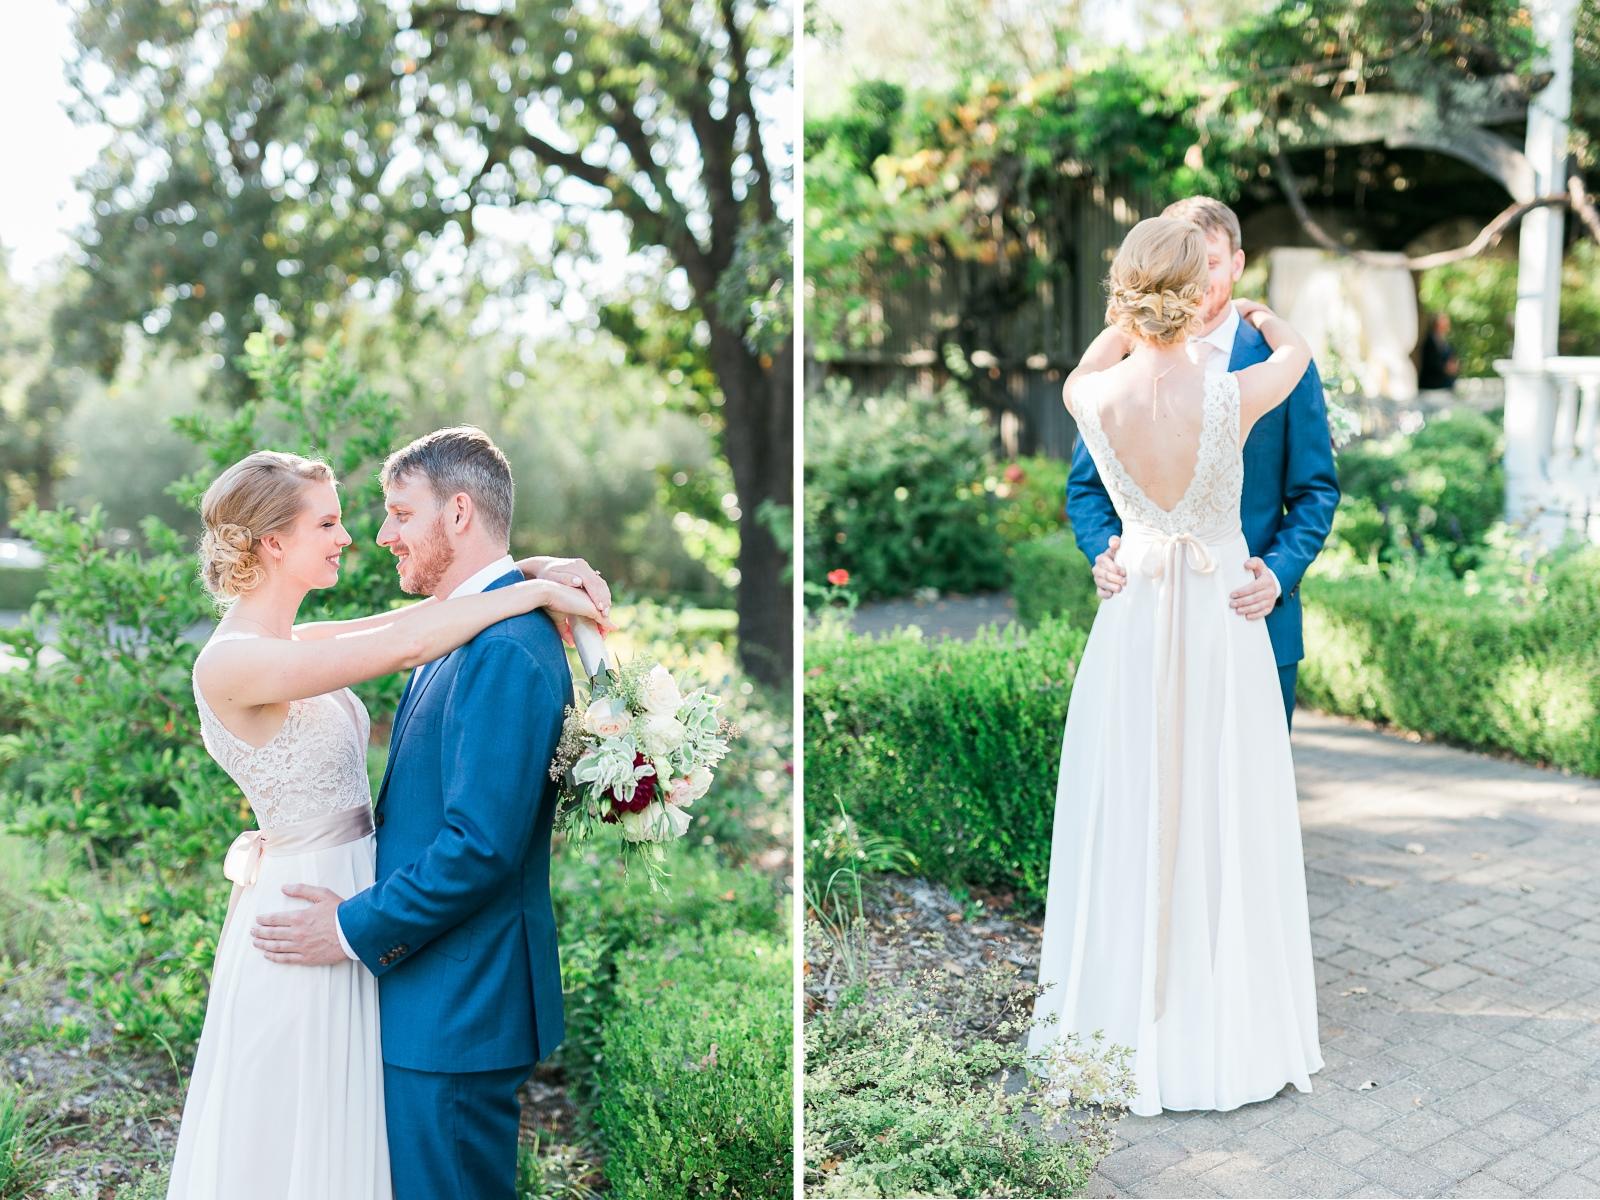 Generals Daughter Wedding Photos by JBJ Pictures - Ramekins Wedding Venue Photographer in Sonoma, Napa (14).jpg